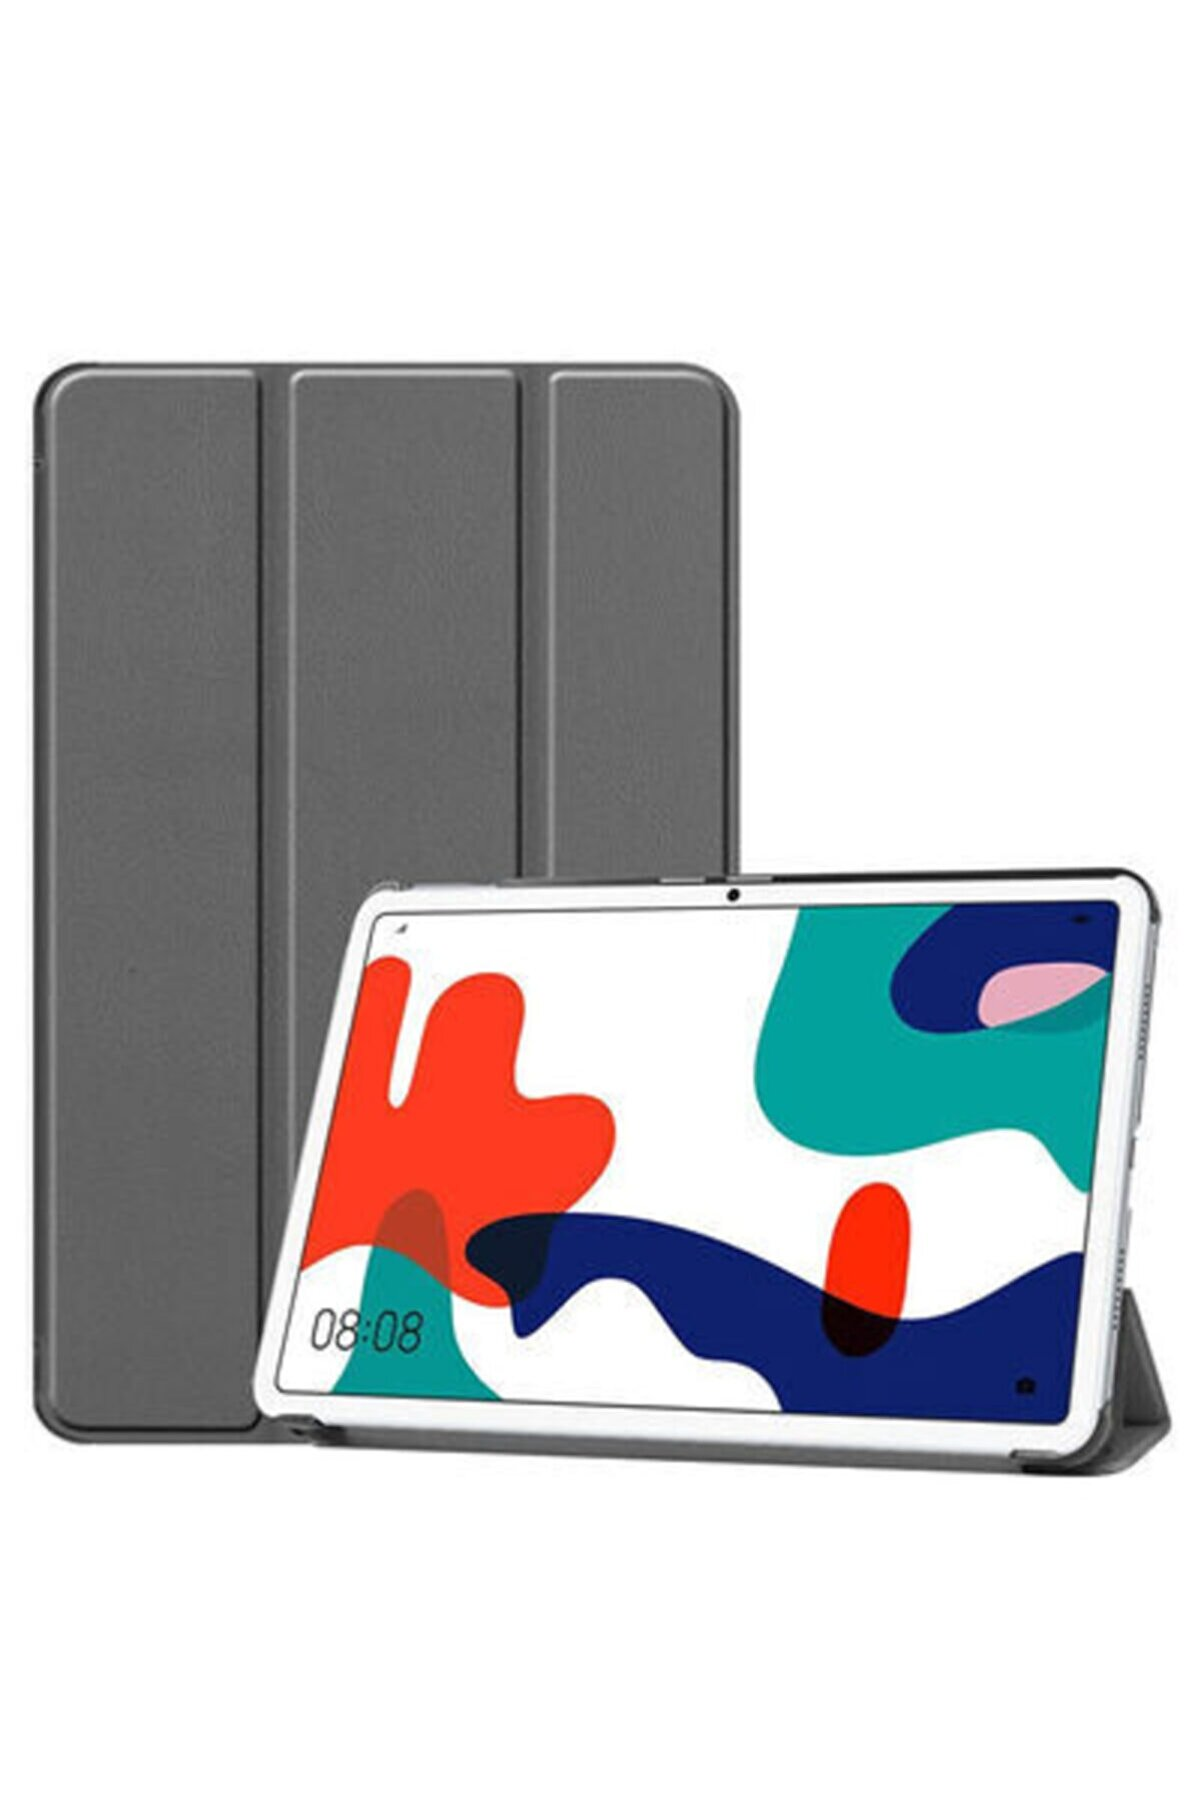 Zore Huawei Mate Pad 10.4 Smart Cover Standlı 1-1 Kılıf